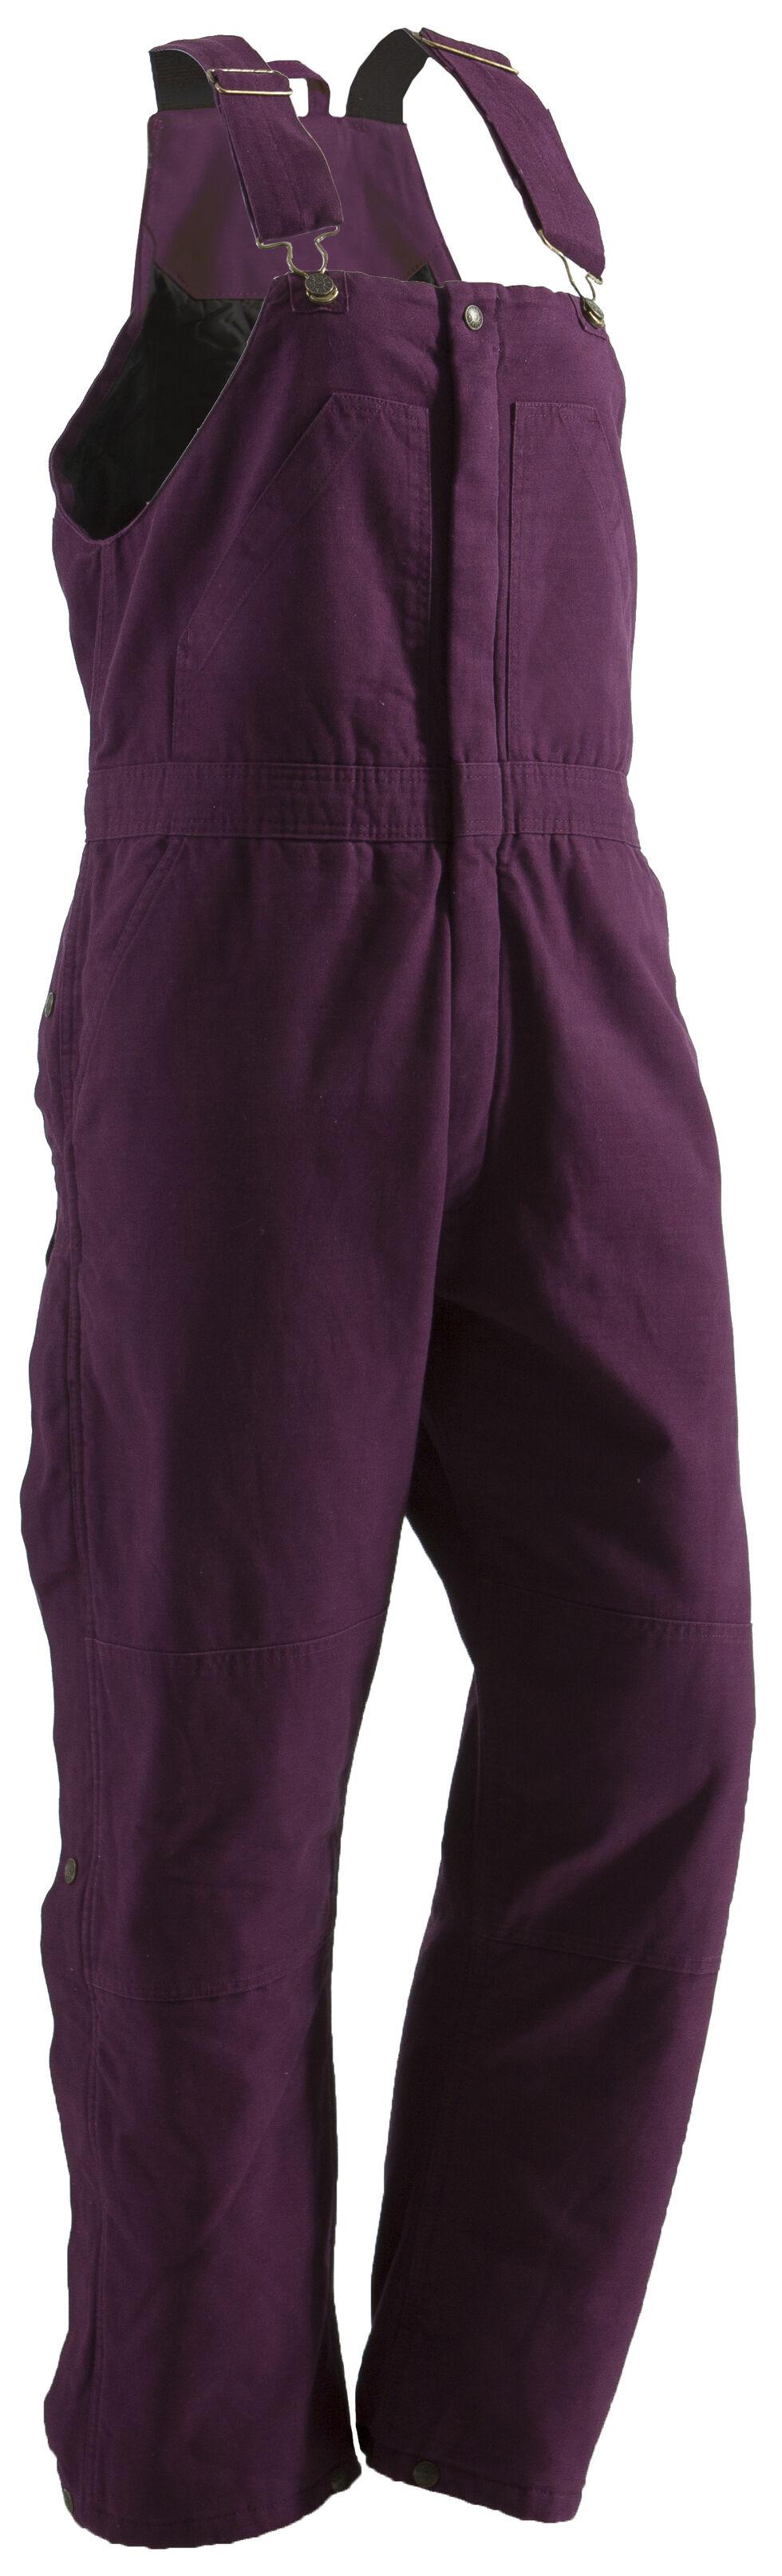 Berne Ladies Washed Insulated Bib Overalls - 3X-4X-Short, Plum, hi-res